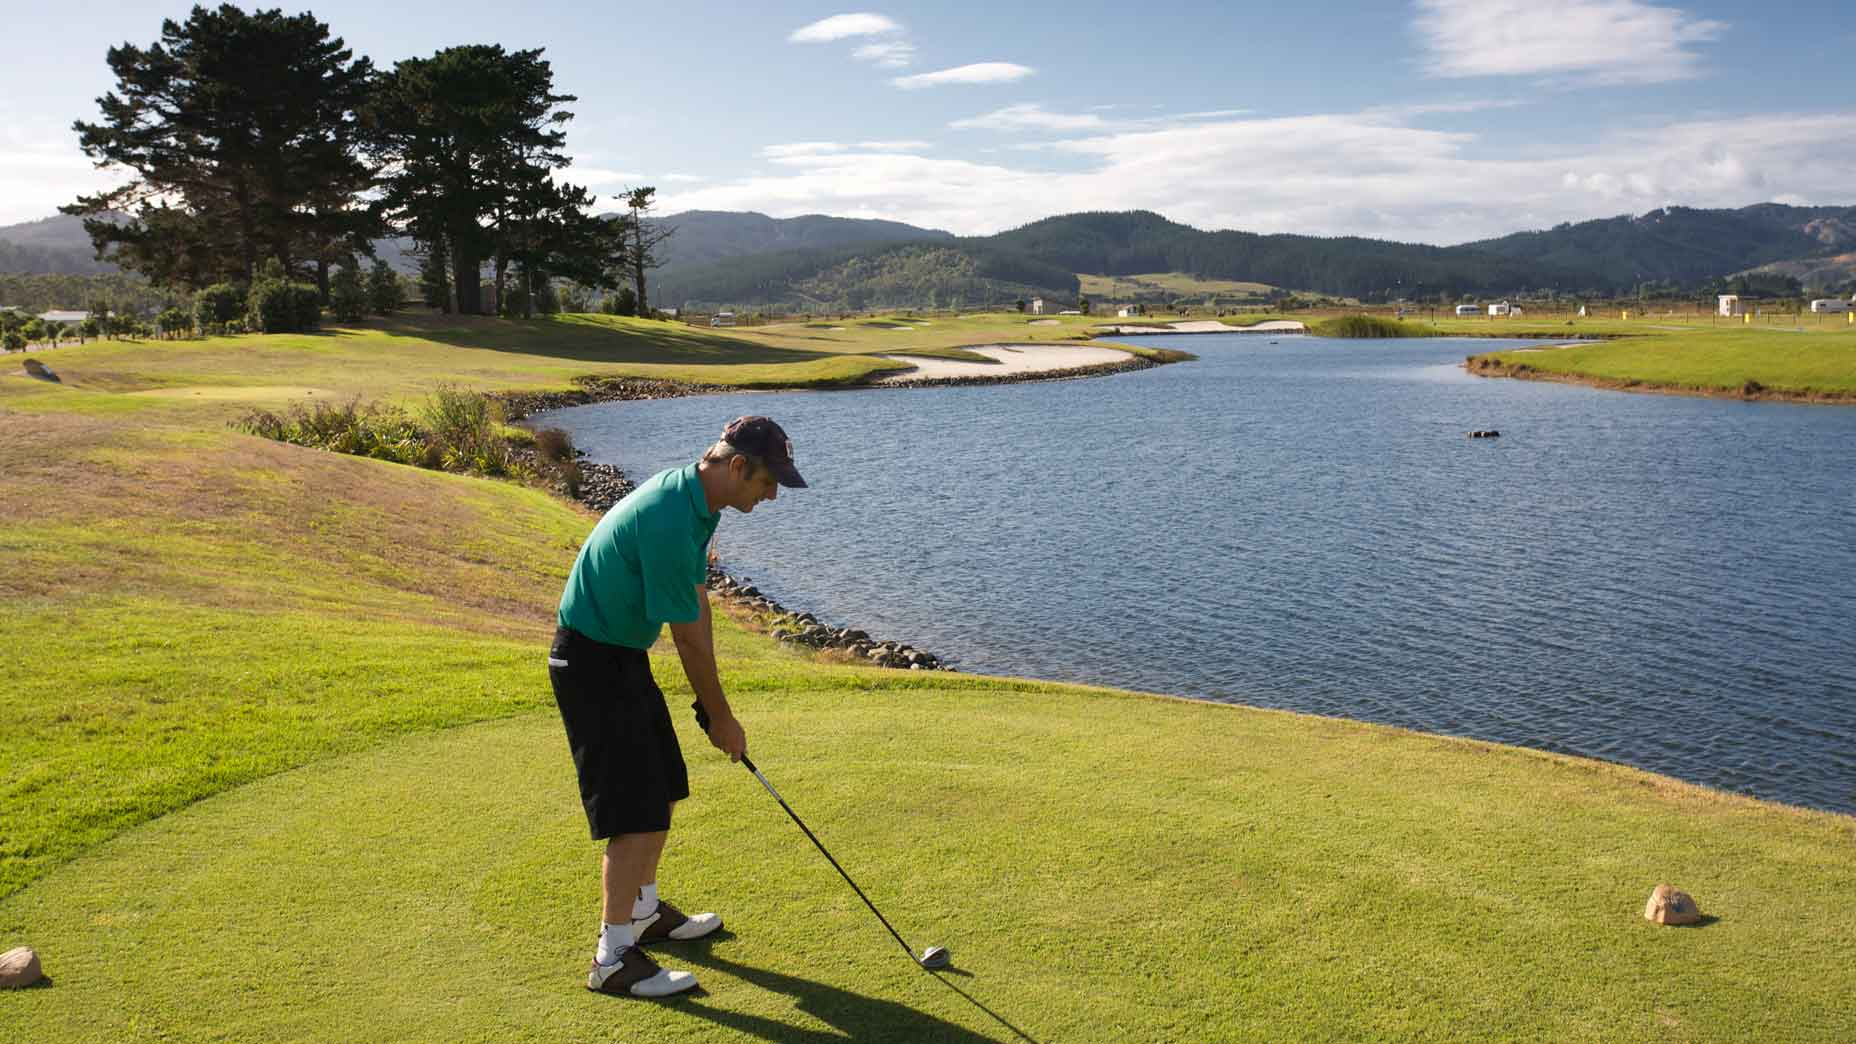 golfer tee shot over water